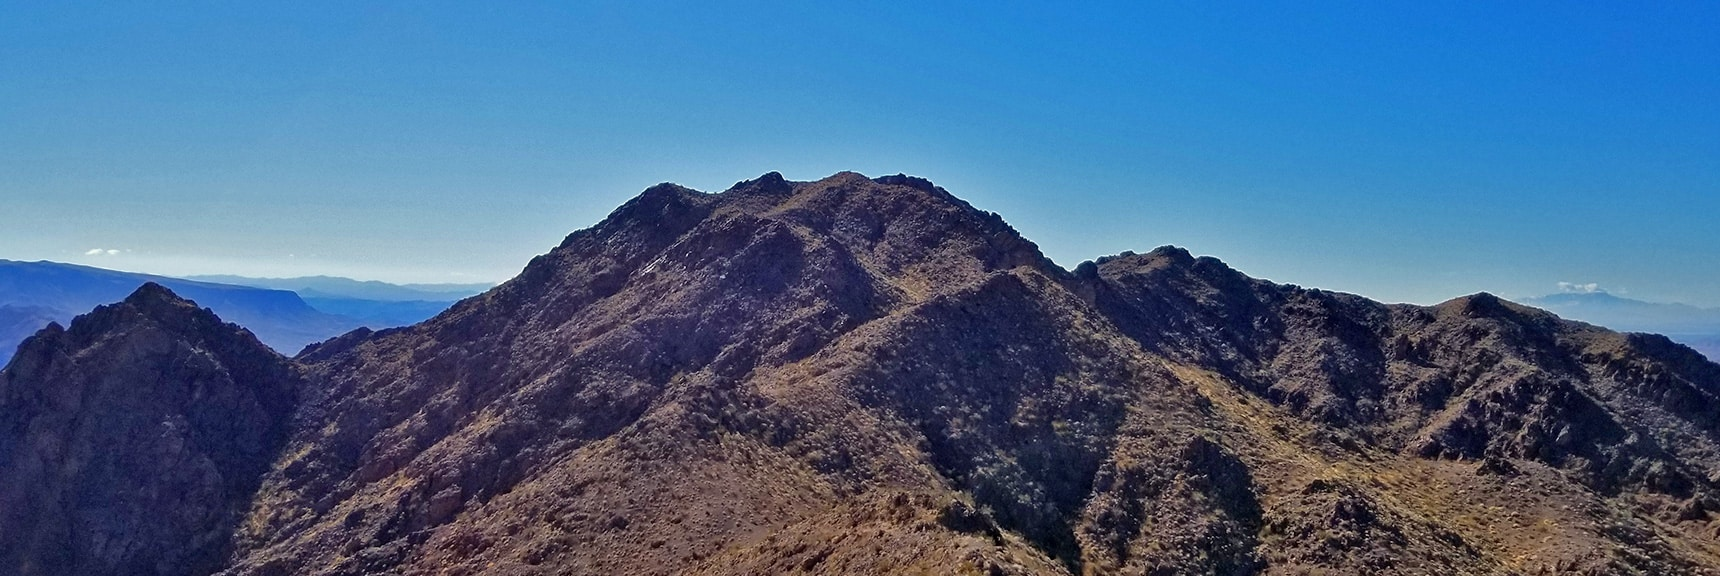 Hamblin Mt. Summit Viewed from a Summit Ridge to the North | Hamblin Mountain, Lake Mead National Conservation Area, Nevada